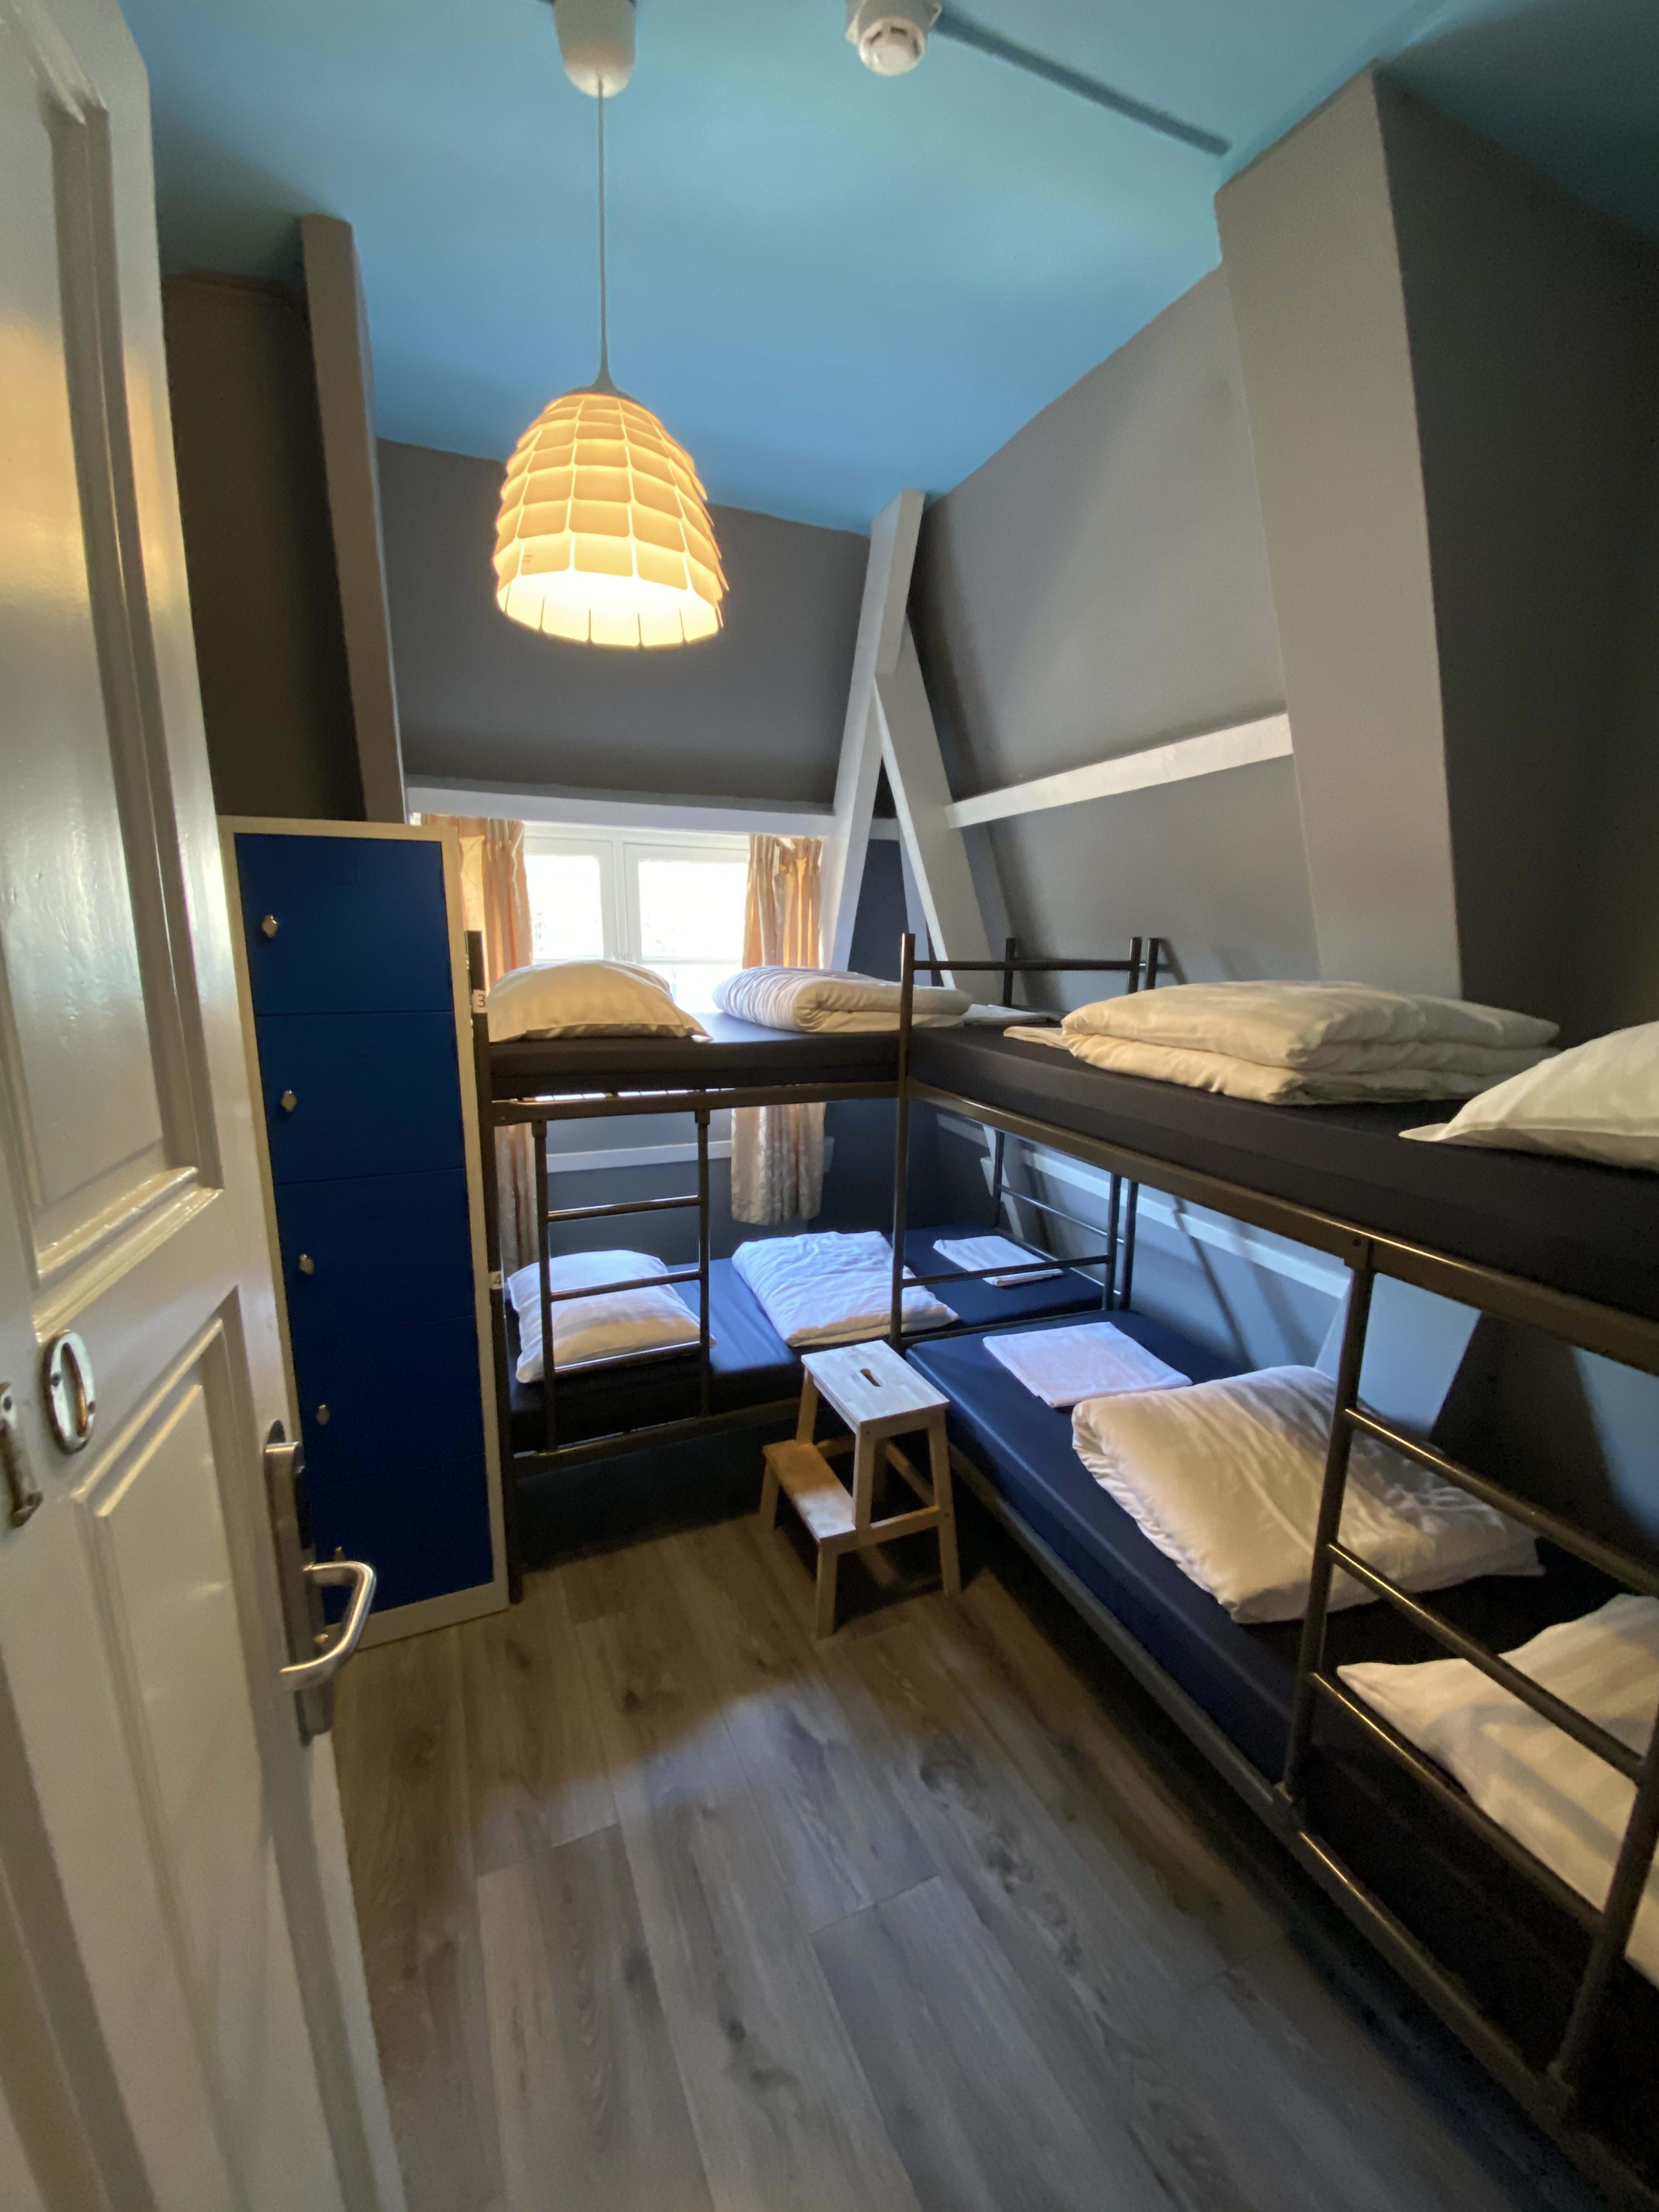 HOSTEL - Hostel Cosmos Amsterdam